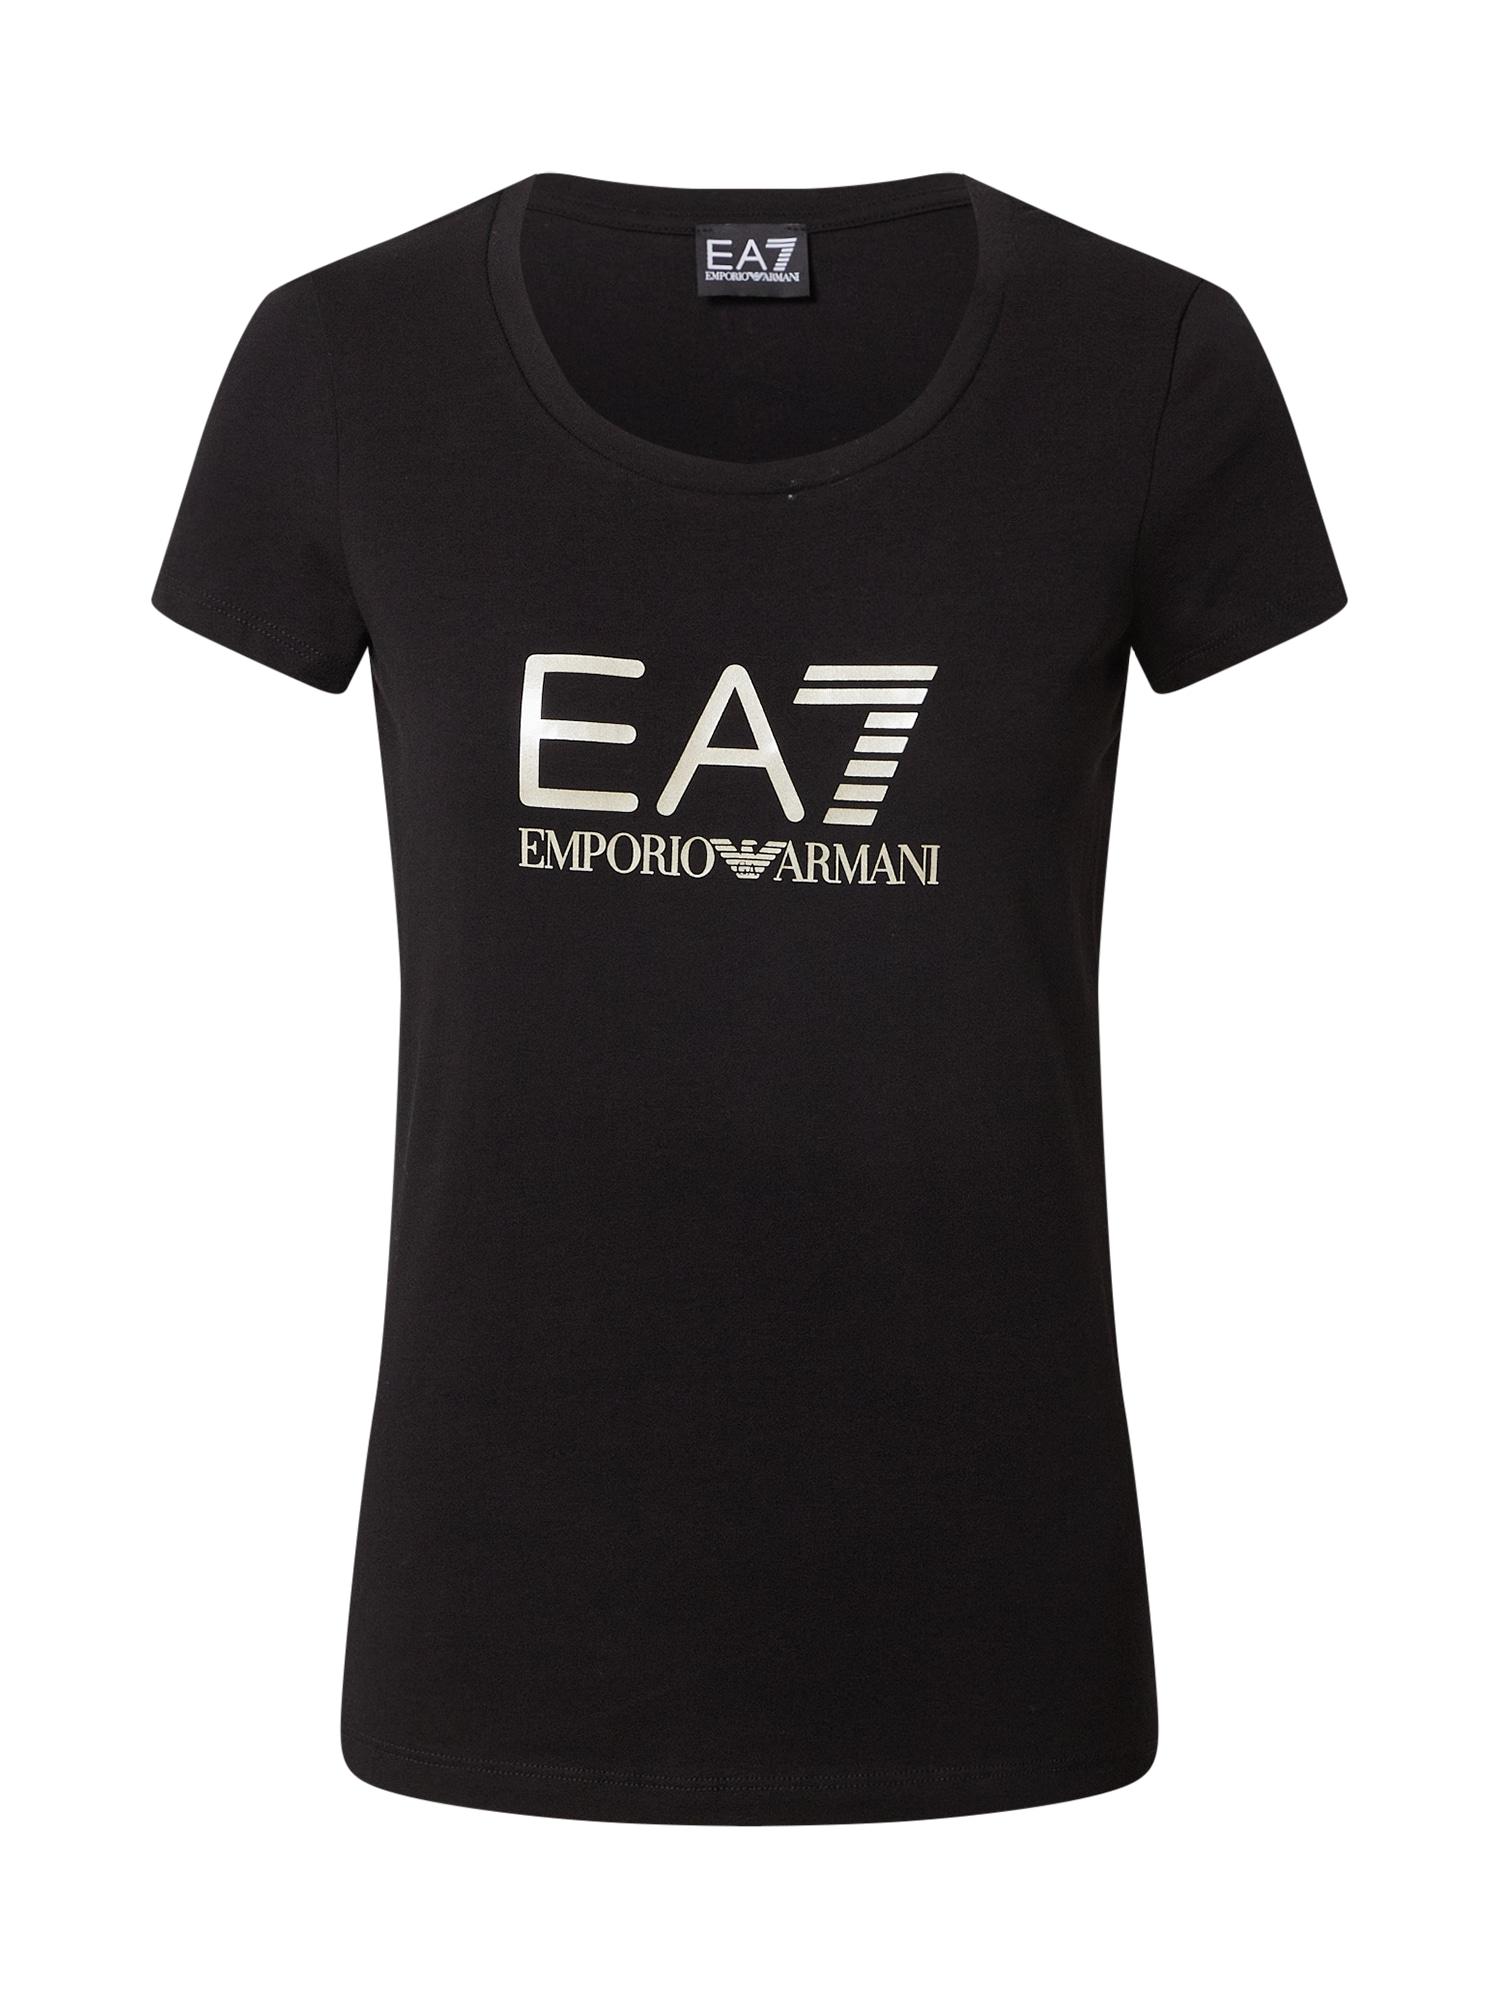 EA7 Emporio Armani Marškinėliai juoda / balta